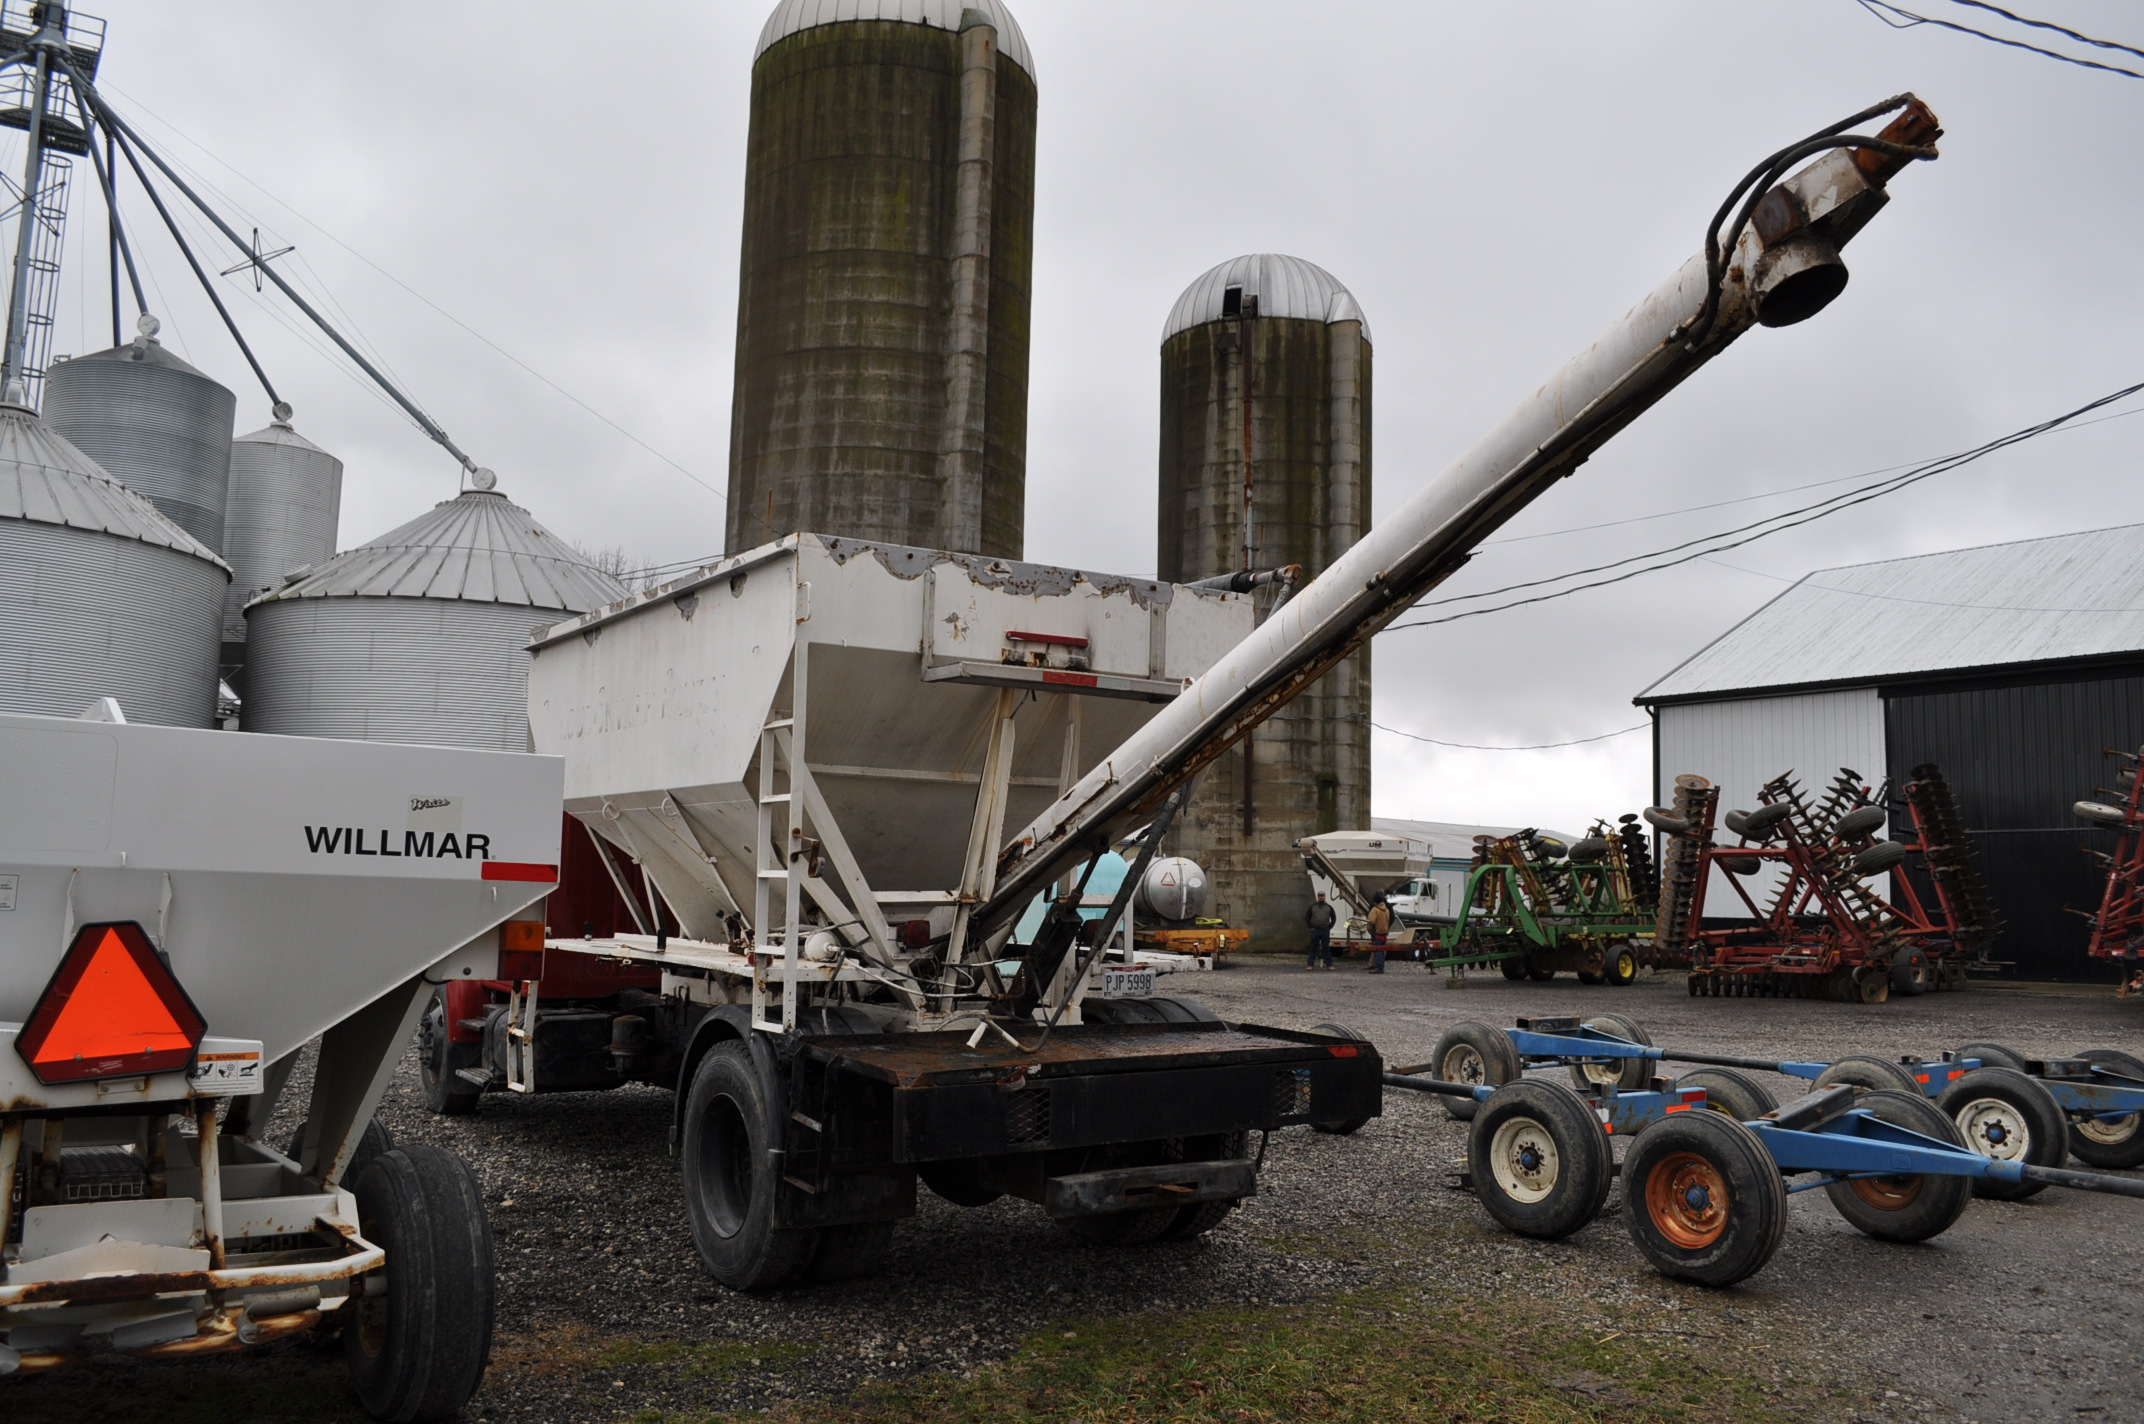 2000 International 4900 dry fertilizer tender truck, single axle, DT466E, Spicer 6 spd, spring ride, - Image 2 of 21